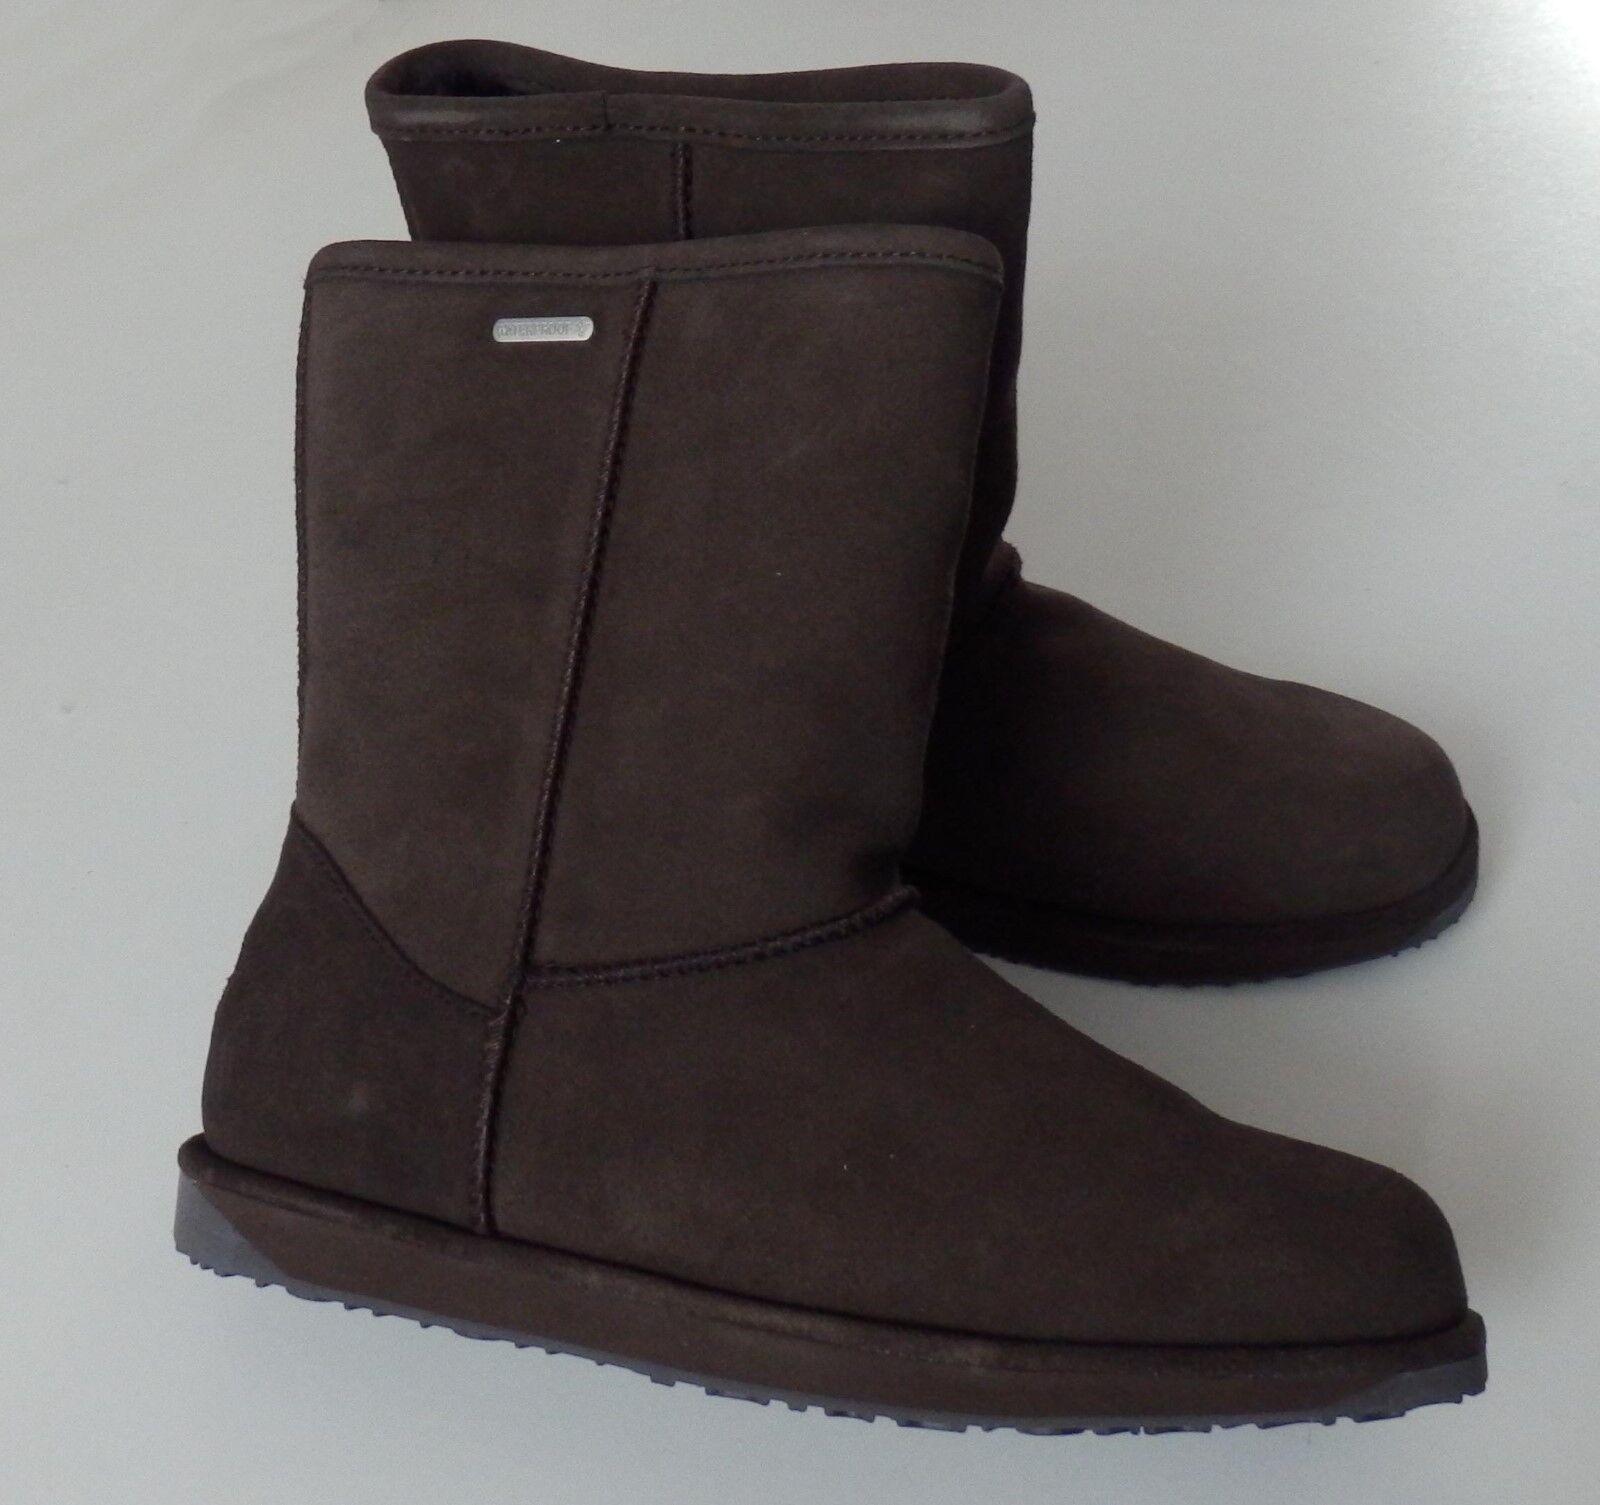 EMU AUSTRALIA Stiefel PATERSON LO W10771 Boot Stiefel AUSTRALIA Lammfell Waterproof Gr. 37 neu 8a3357